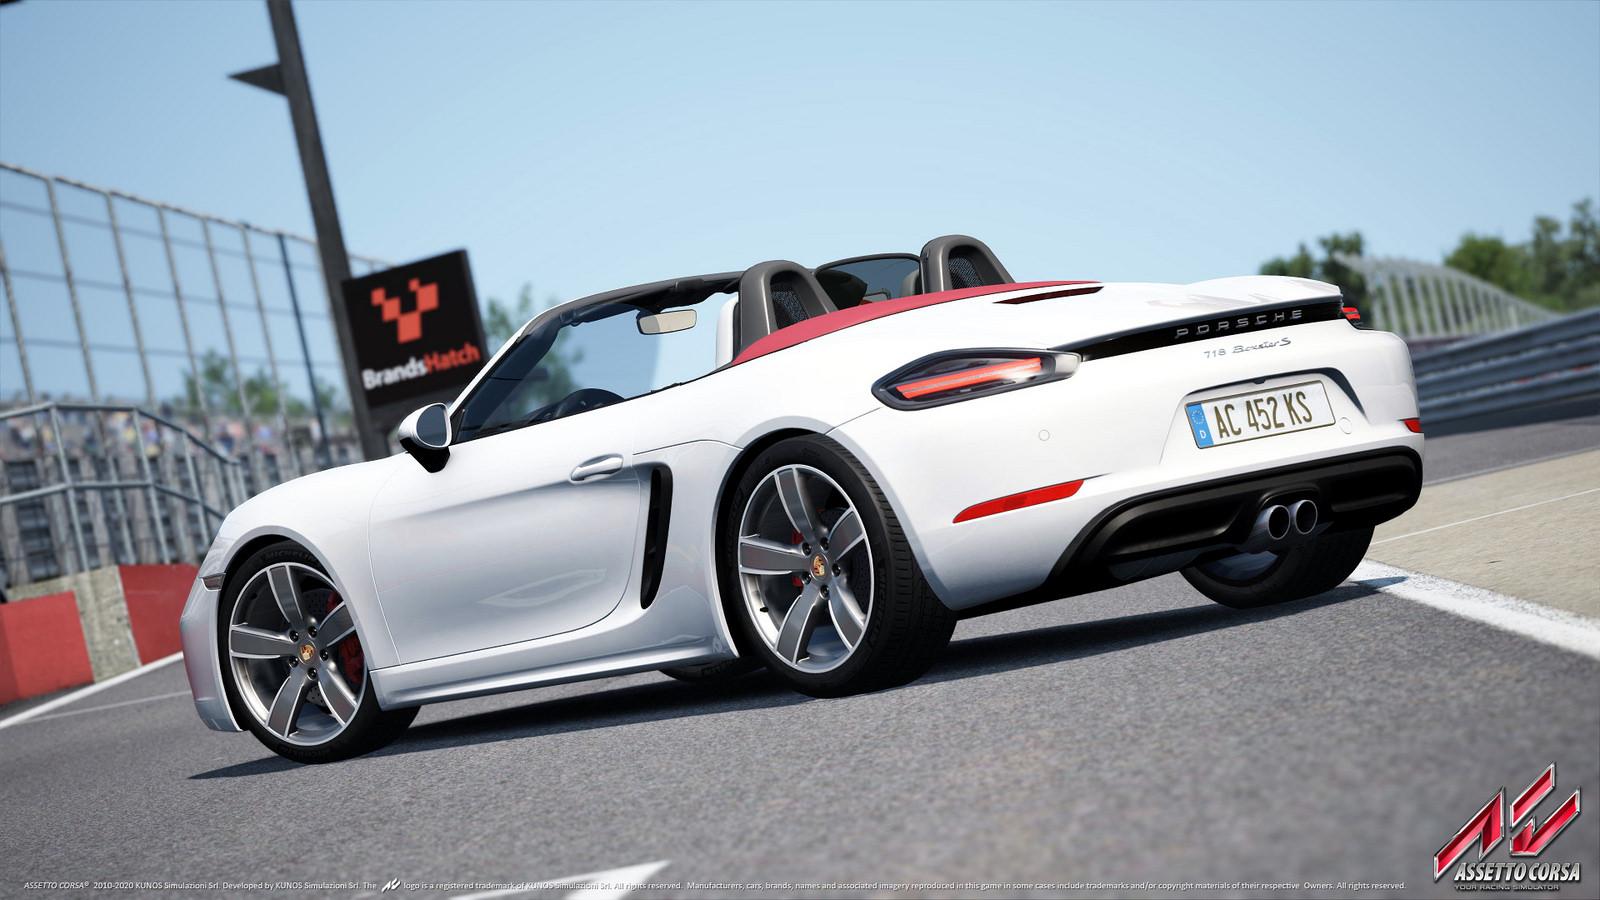 Second Porsche Dlc Pack For Assetto Corsa Out Now